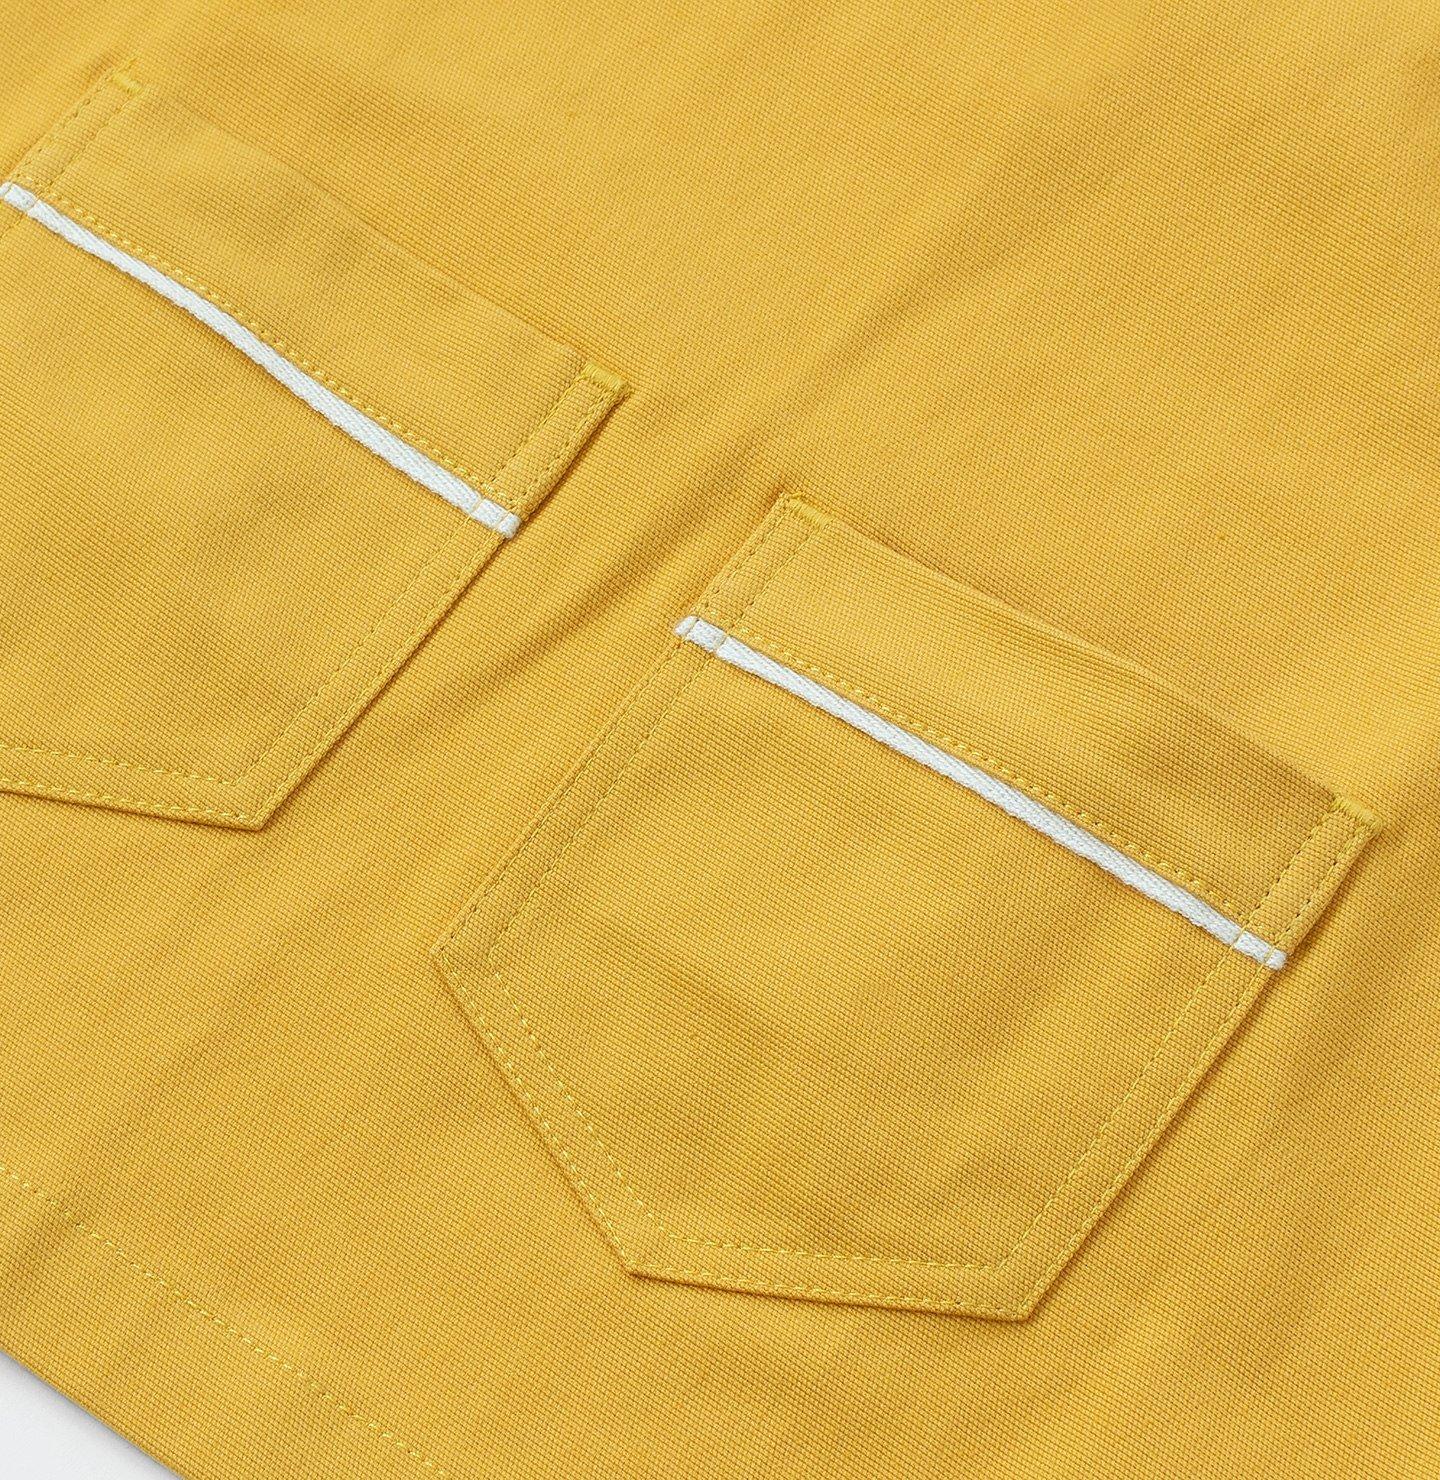 Two Lap Pockets